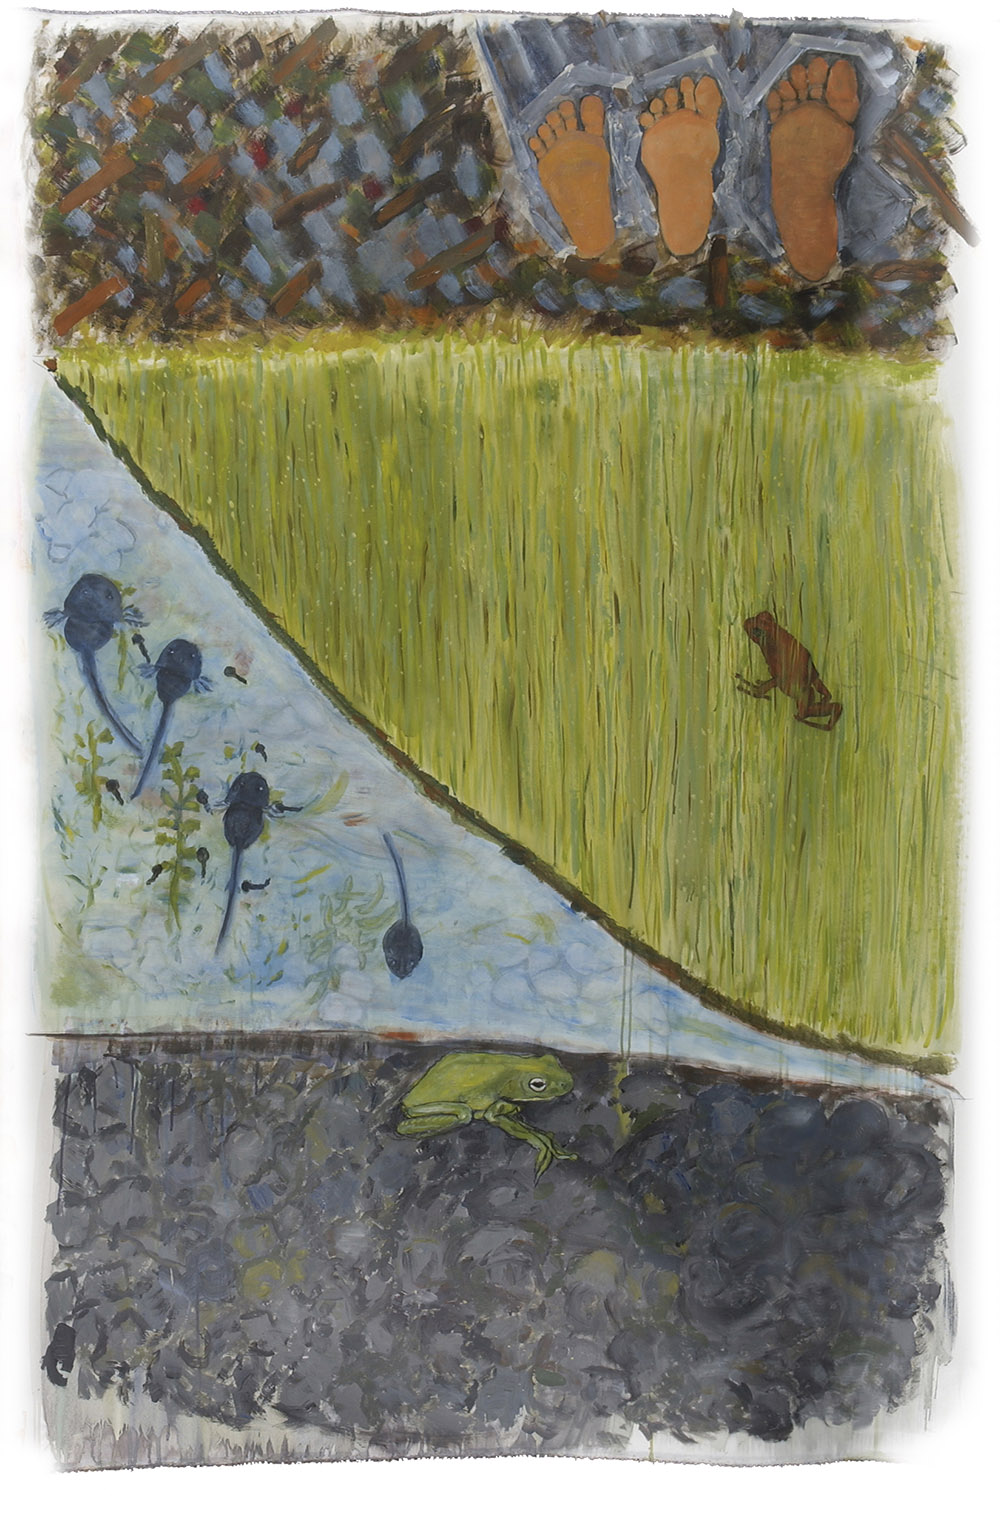 1.b-Ono-Lazy-Afternoon-2008.-Acrylic-on-canvas-approx.-200-x-140-cm-x.jpg